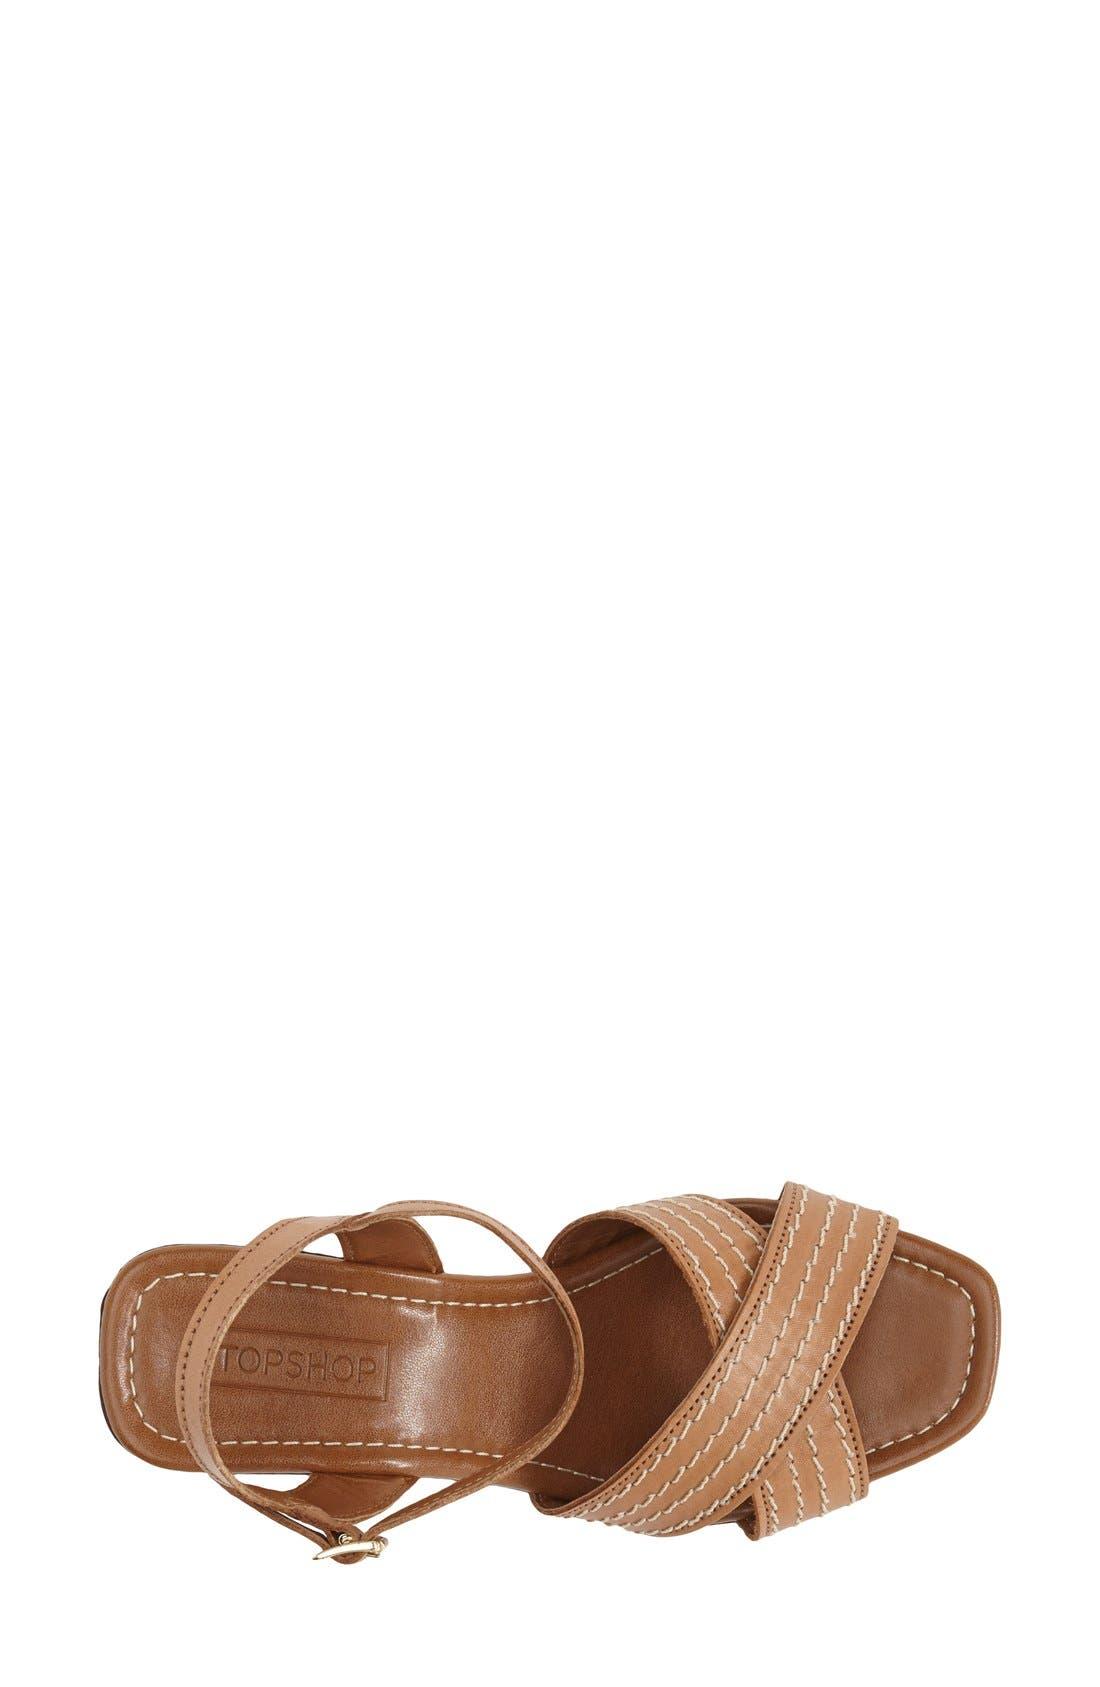 Alternate Image 3  - Topshop 'Lauren' Clog Sandal (Women)